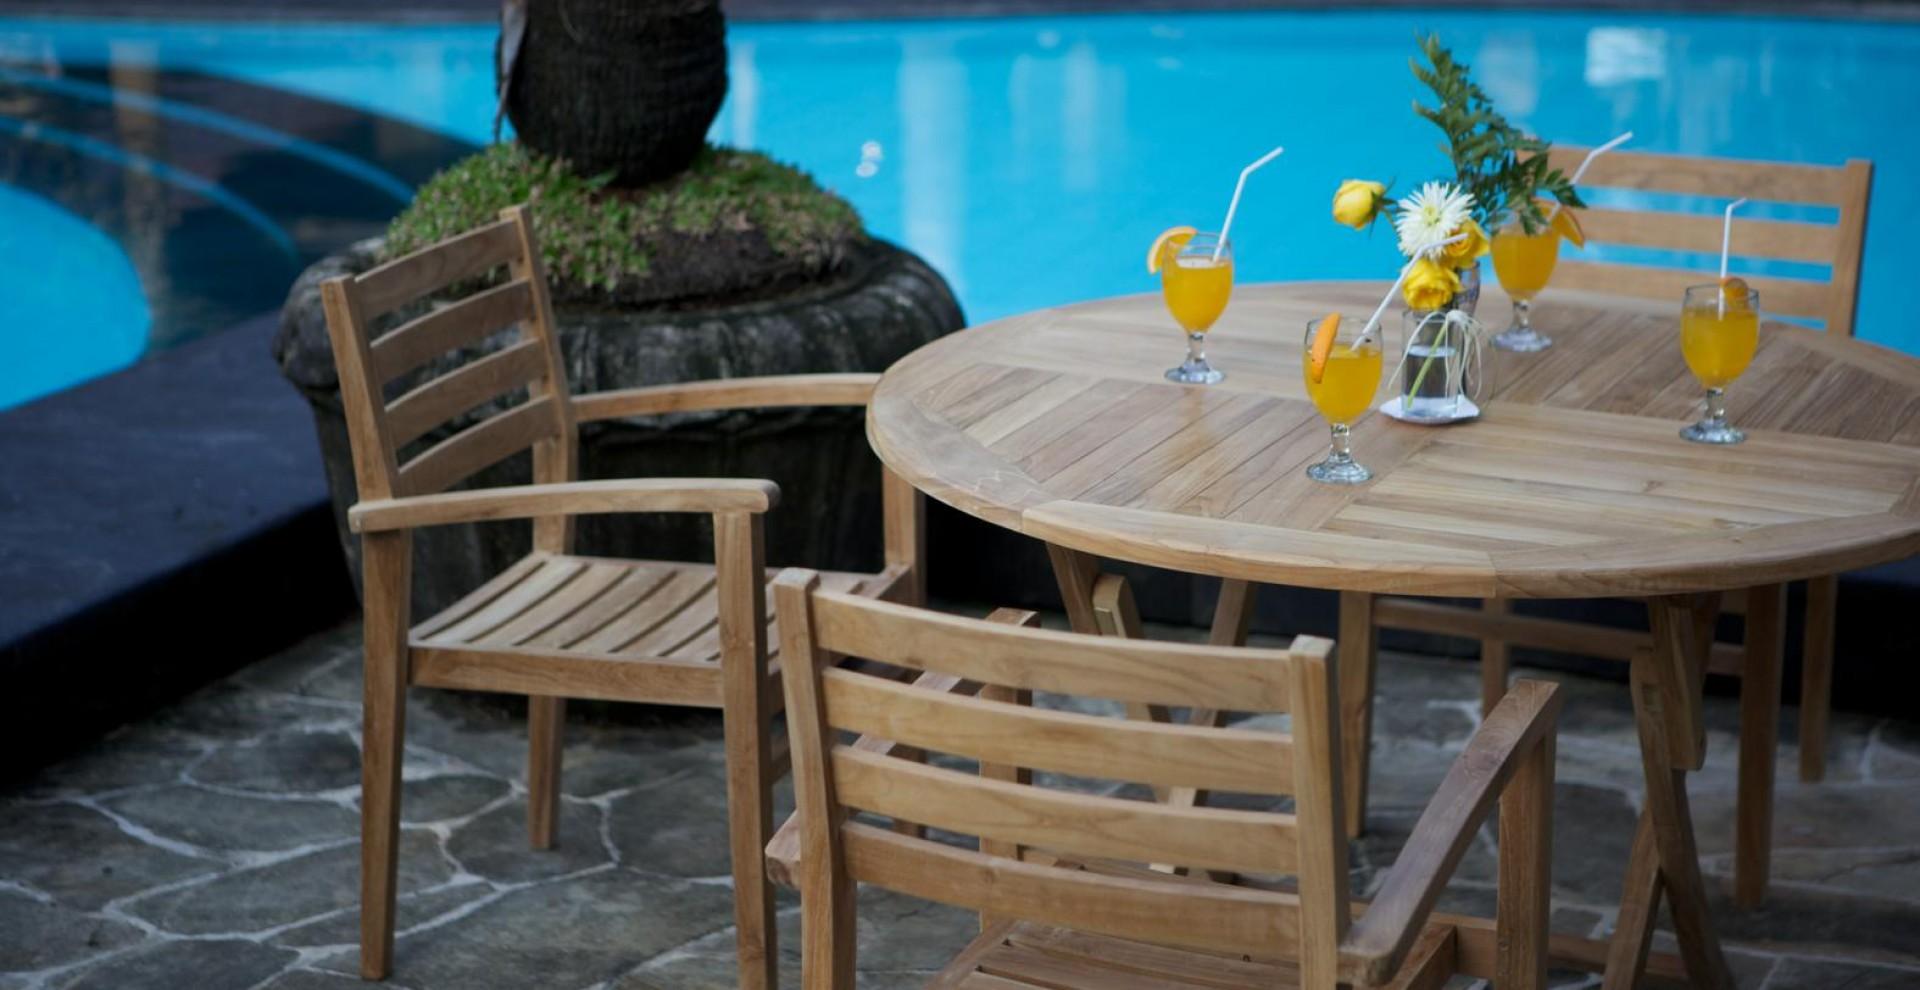 tisch easy klappbar rund aus teakholz. Black Bedroom Furniture Sets. Home Design Ideas